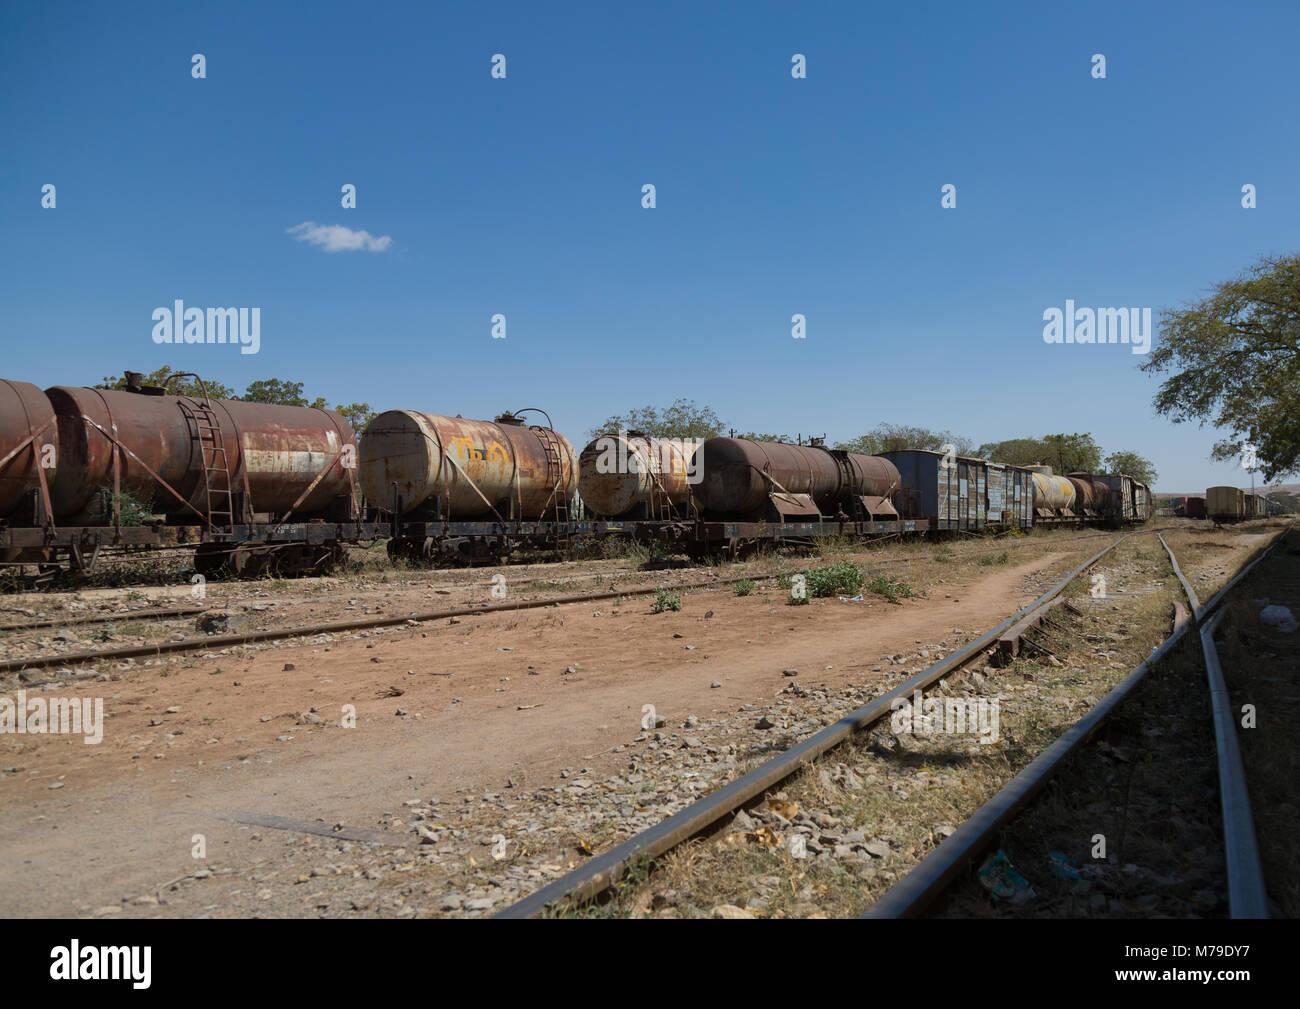 Tracks of the ethio-djibouti railway station, Dire dawa